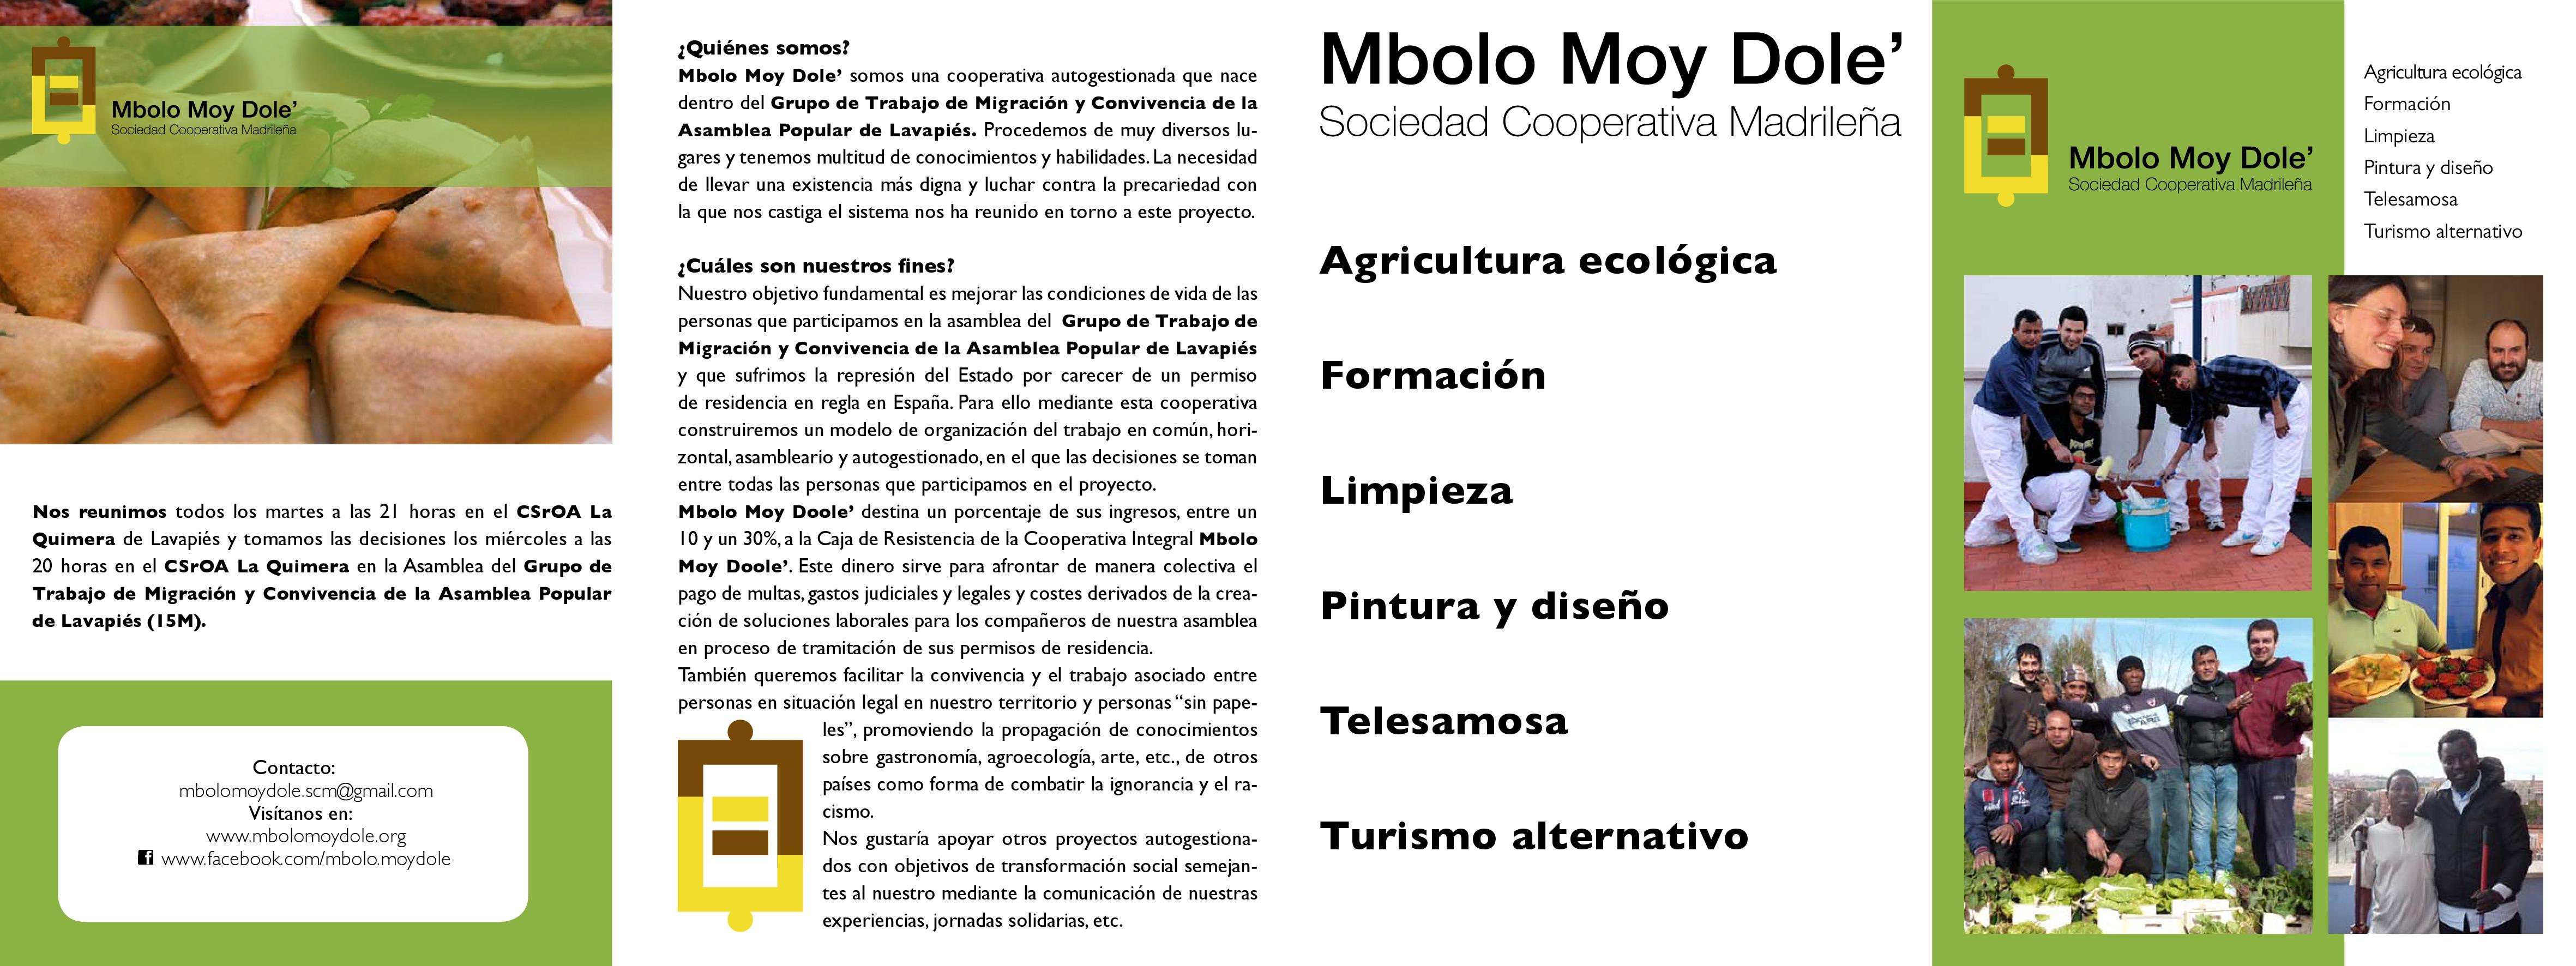 Tríptico Mbolo 1